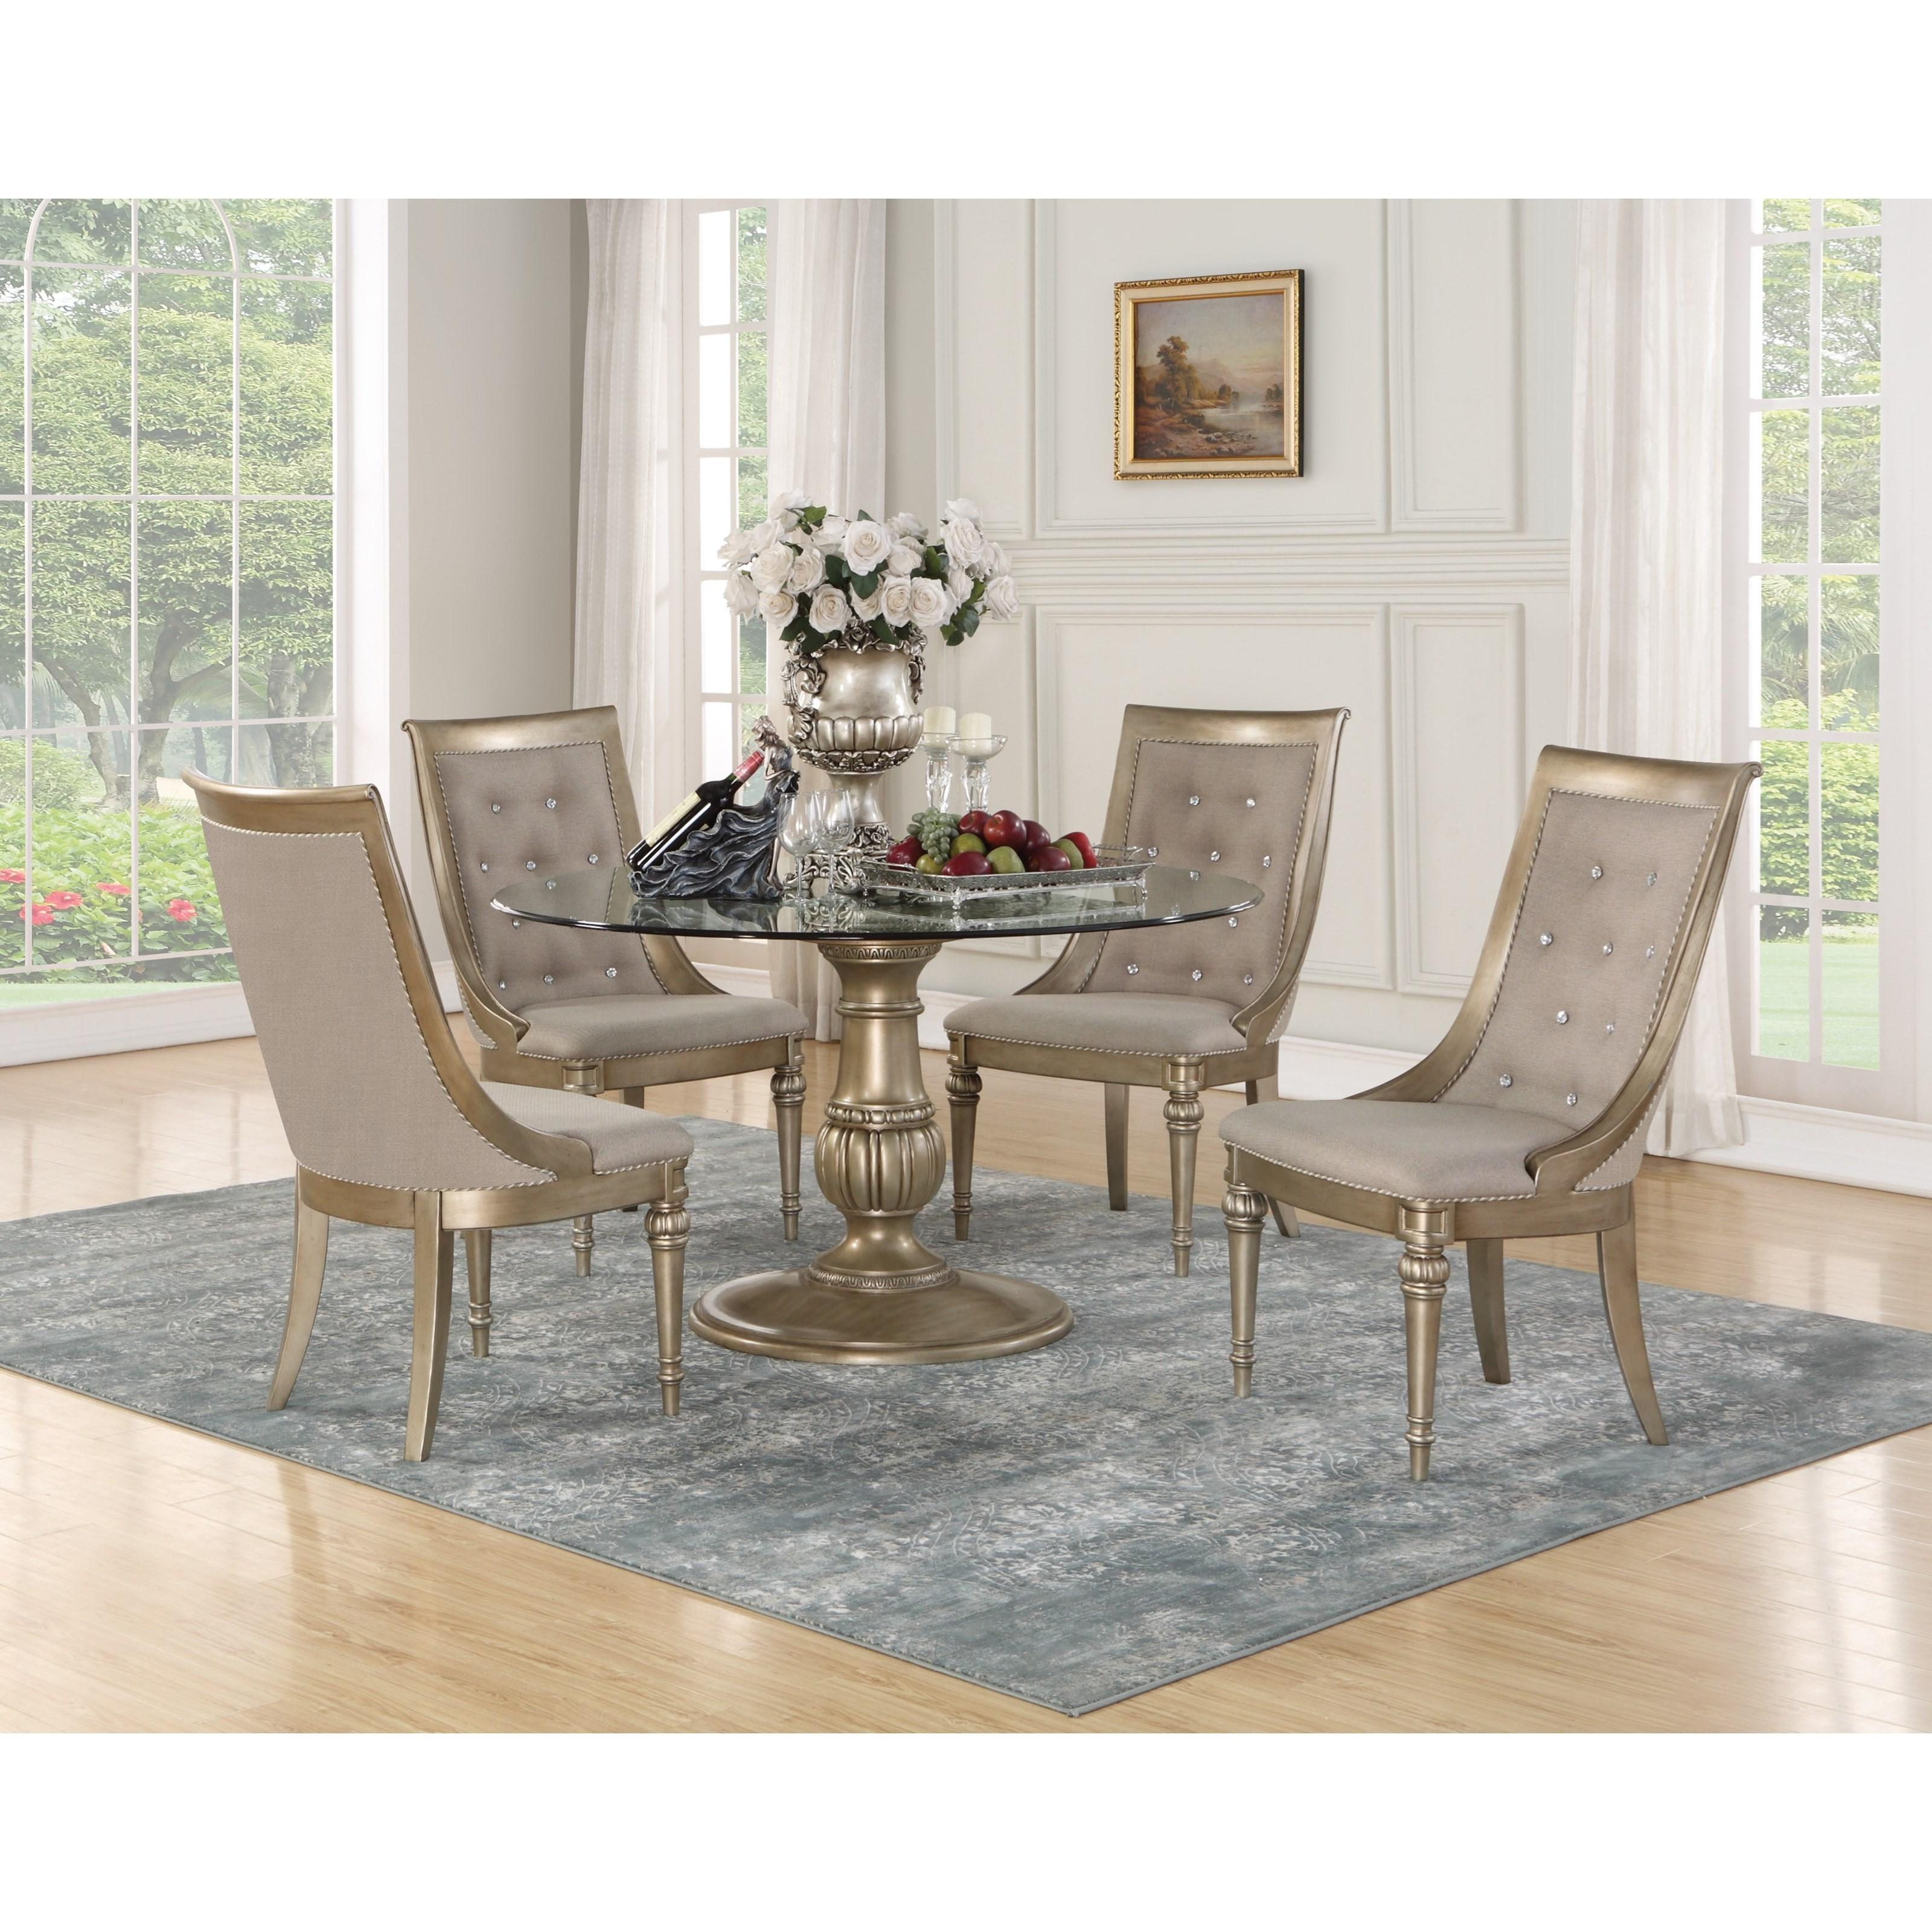 Dining Room Tables San Diego: Flexsteel Wynwood Collection San Cristobal 5 Piece Round